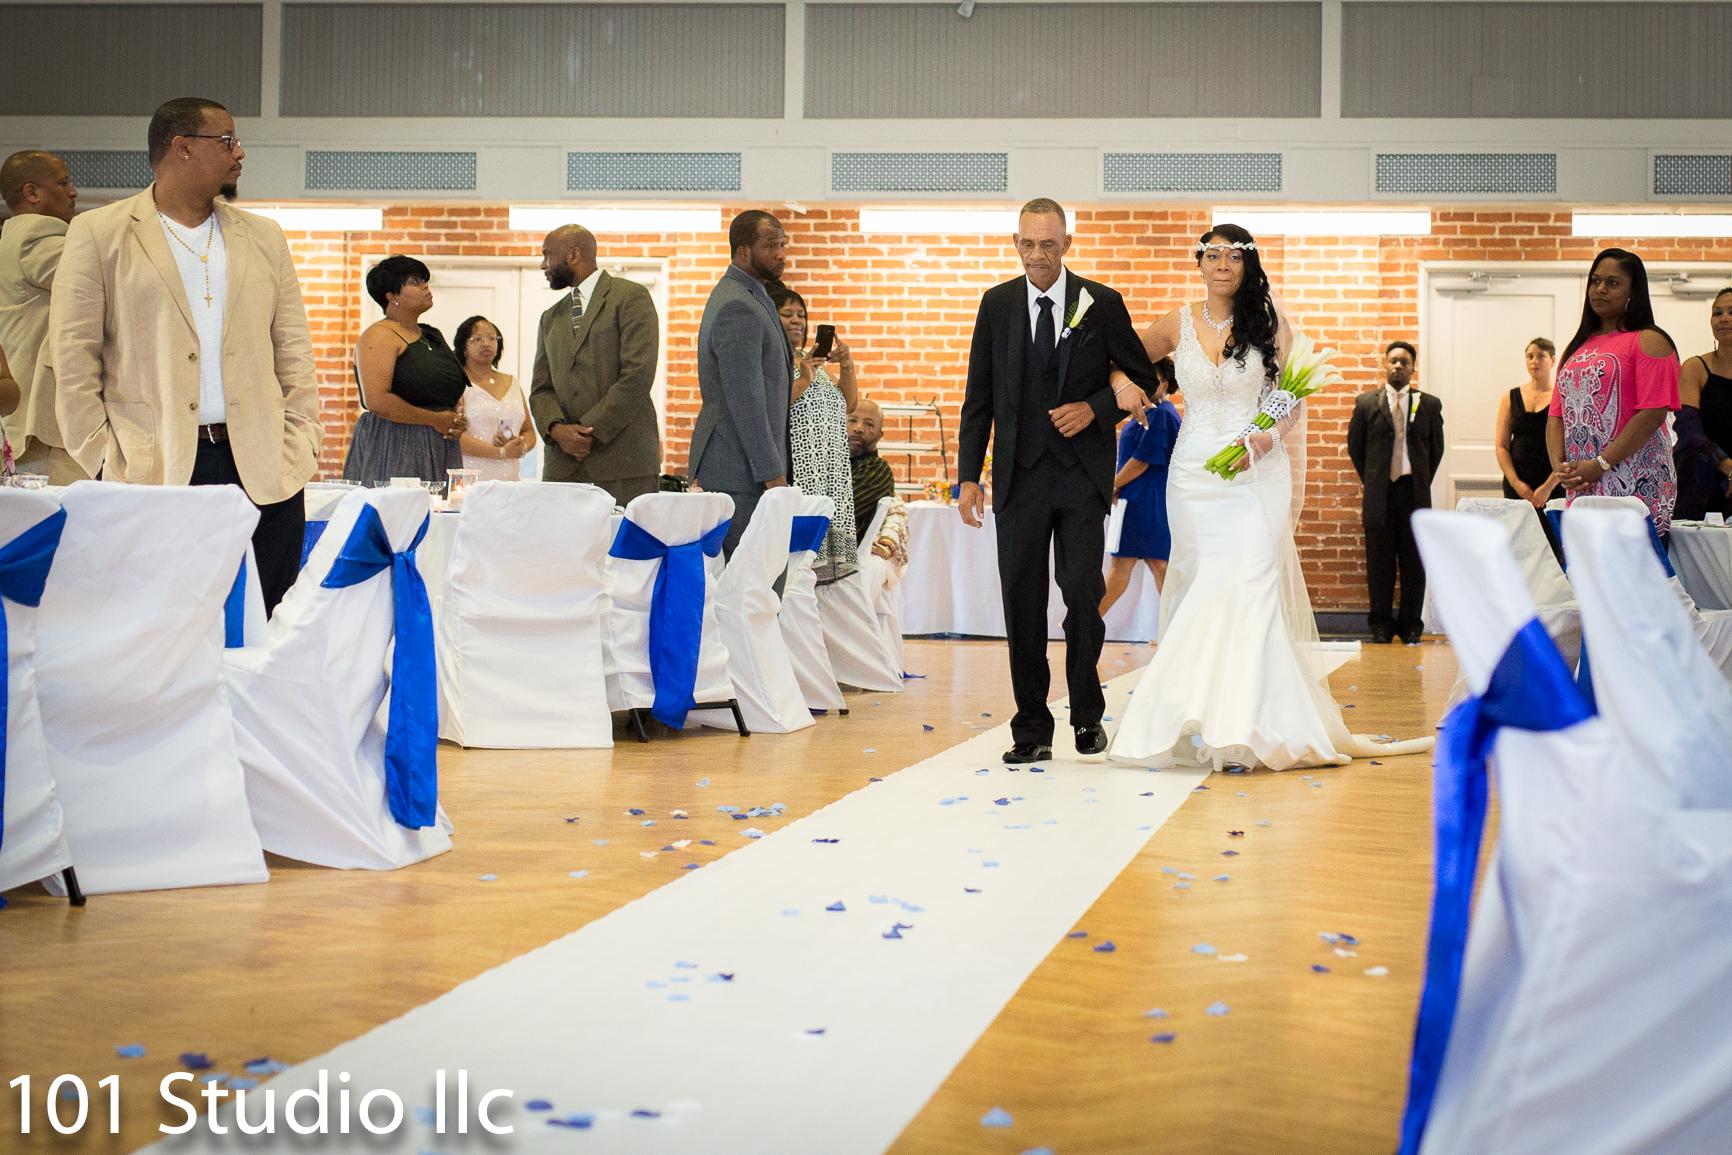 Raleigh  wedding photographer - 101 Studio llc -7.jpg